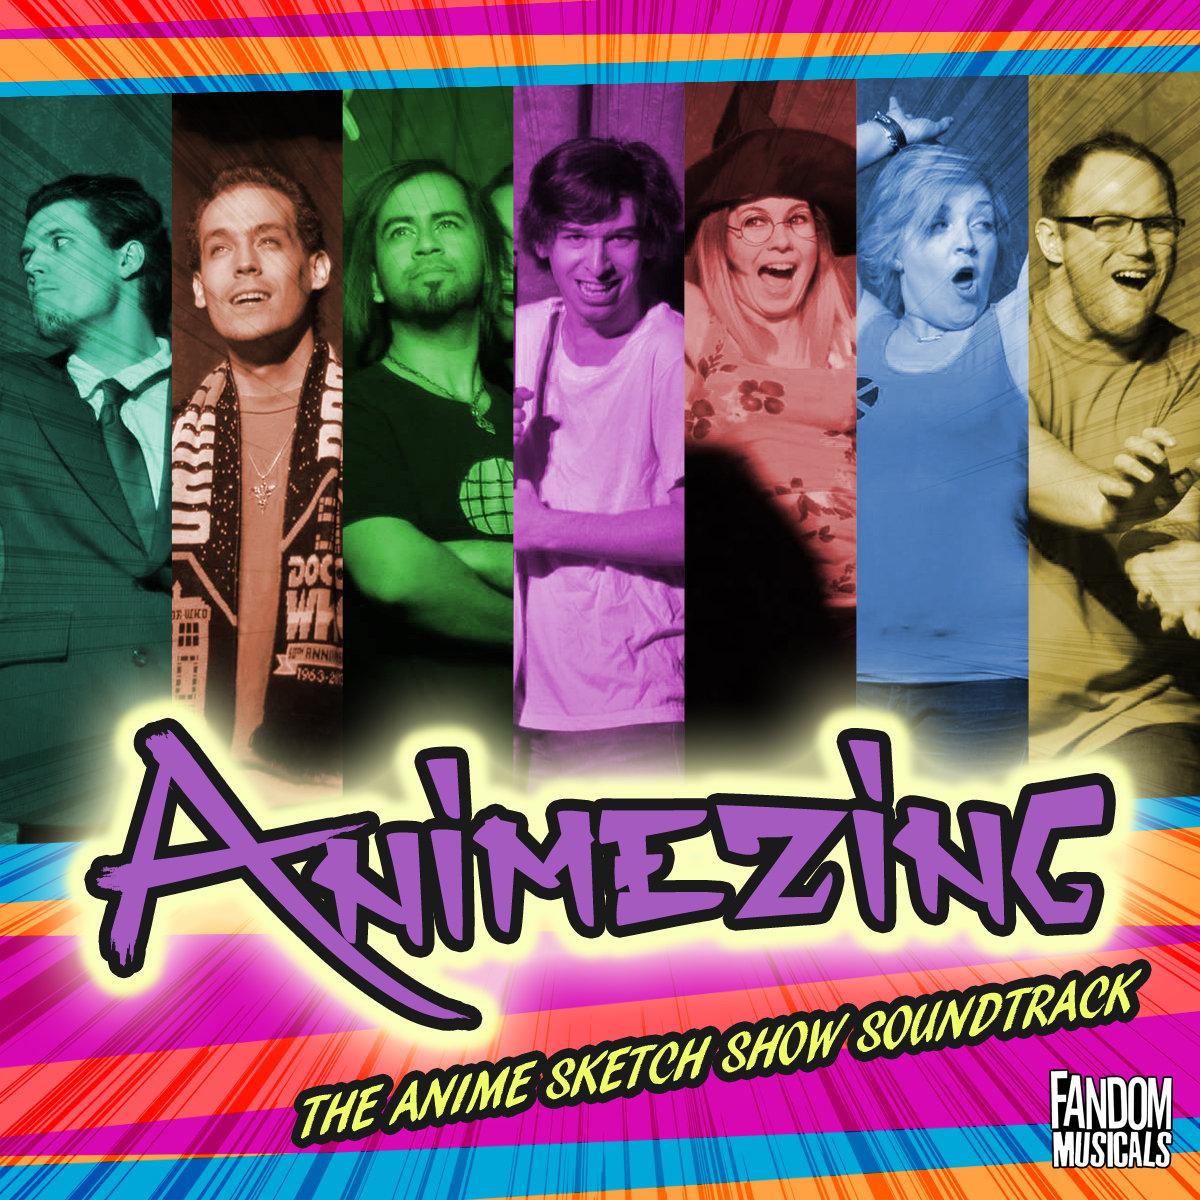 Animezing by fandom musicals